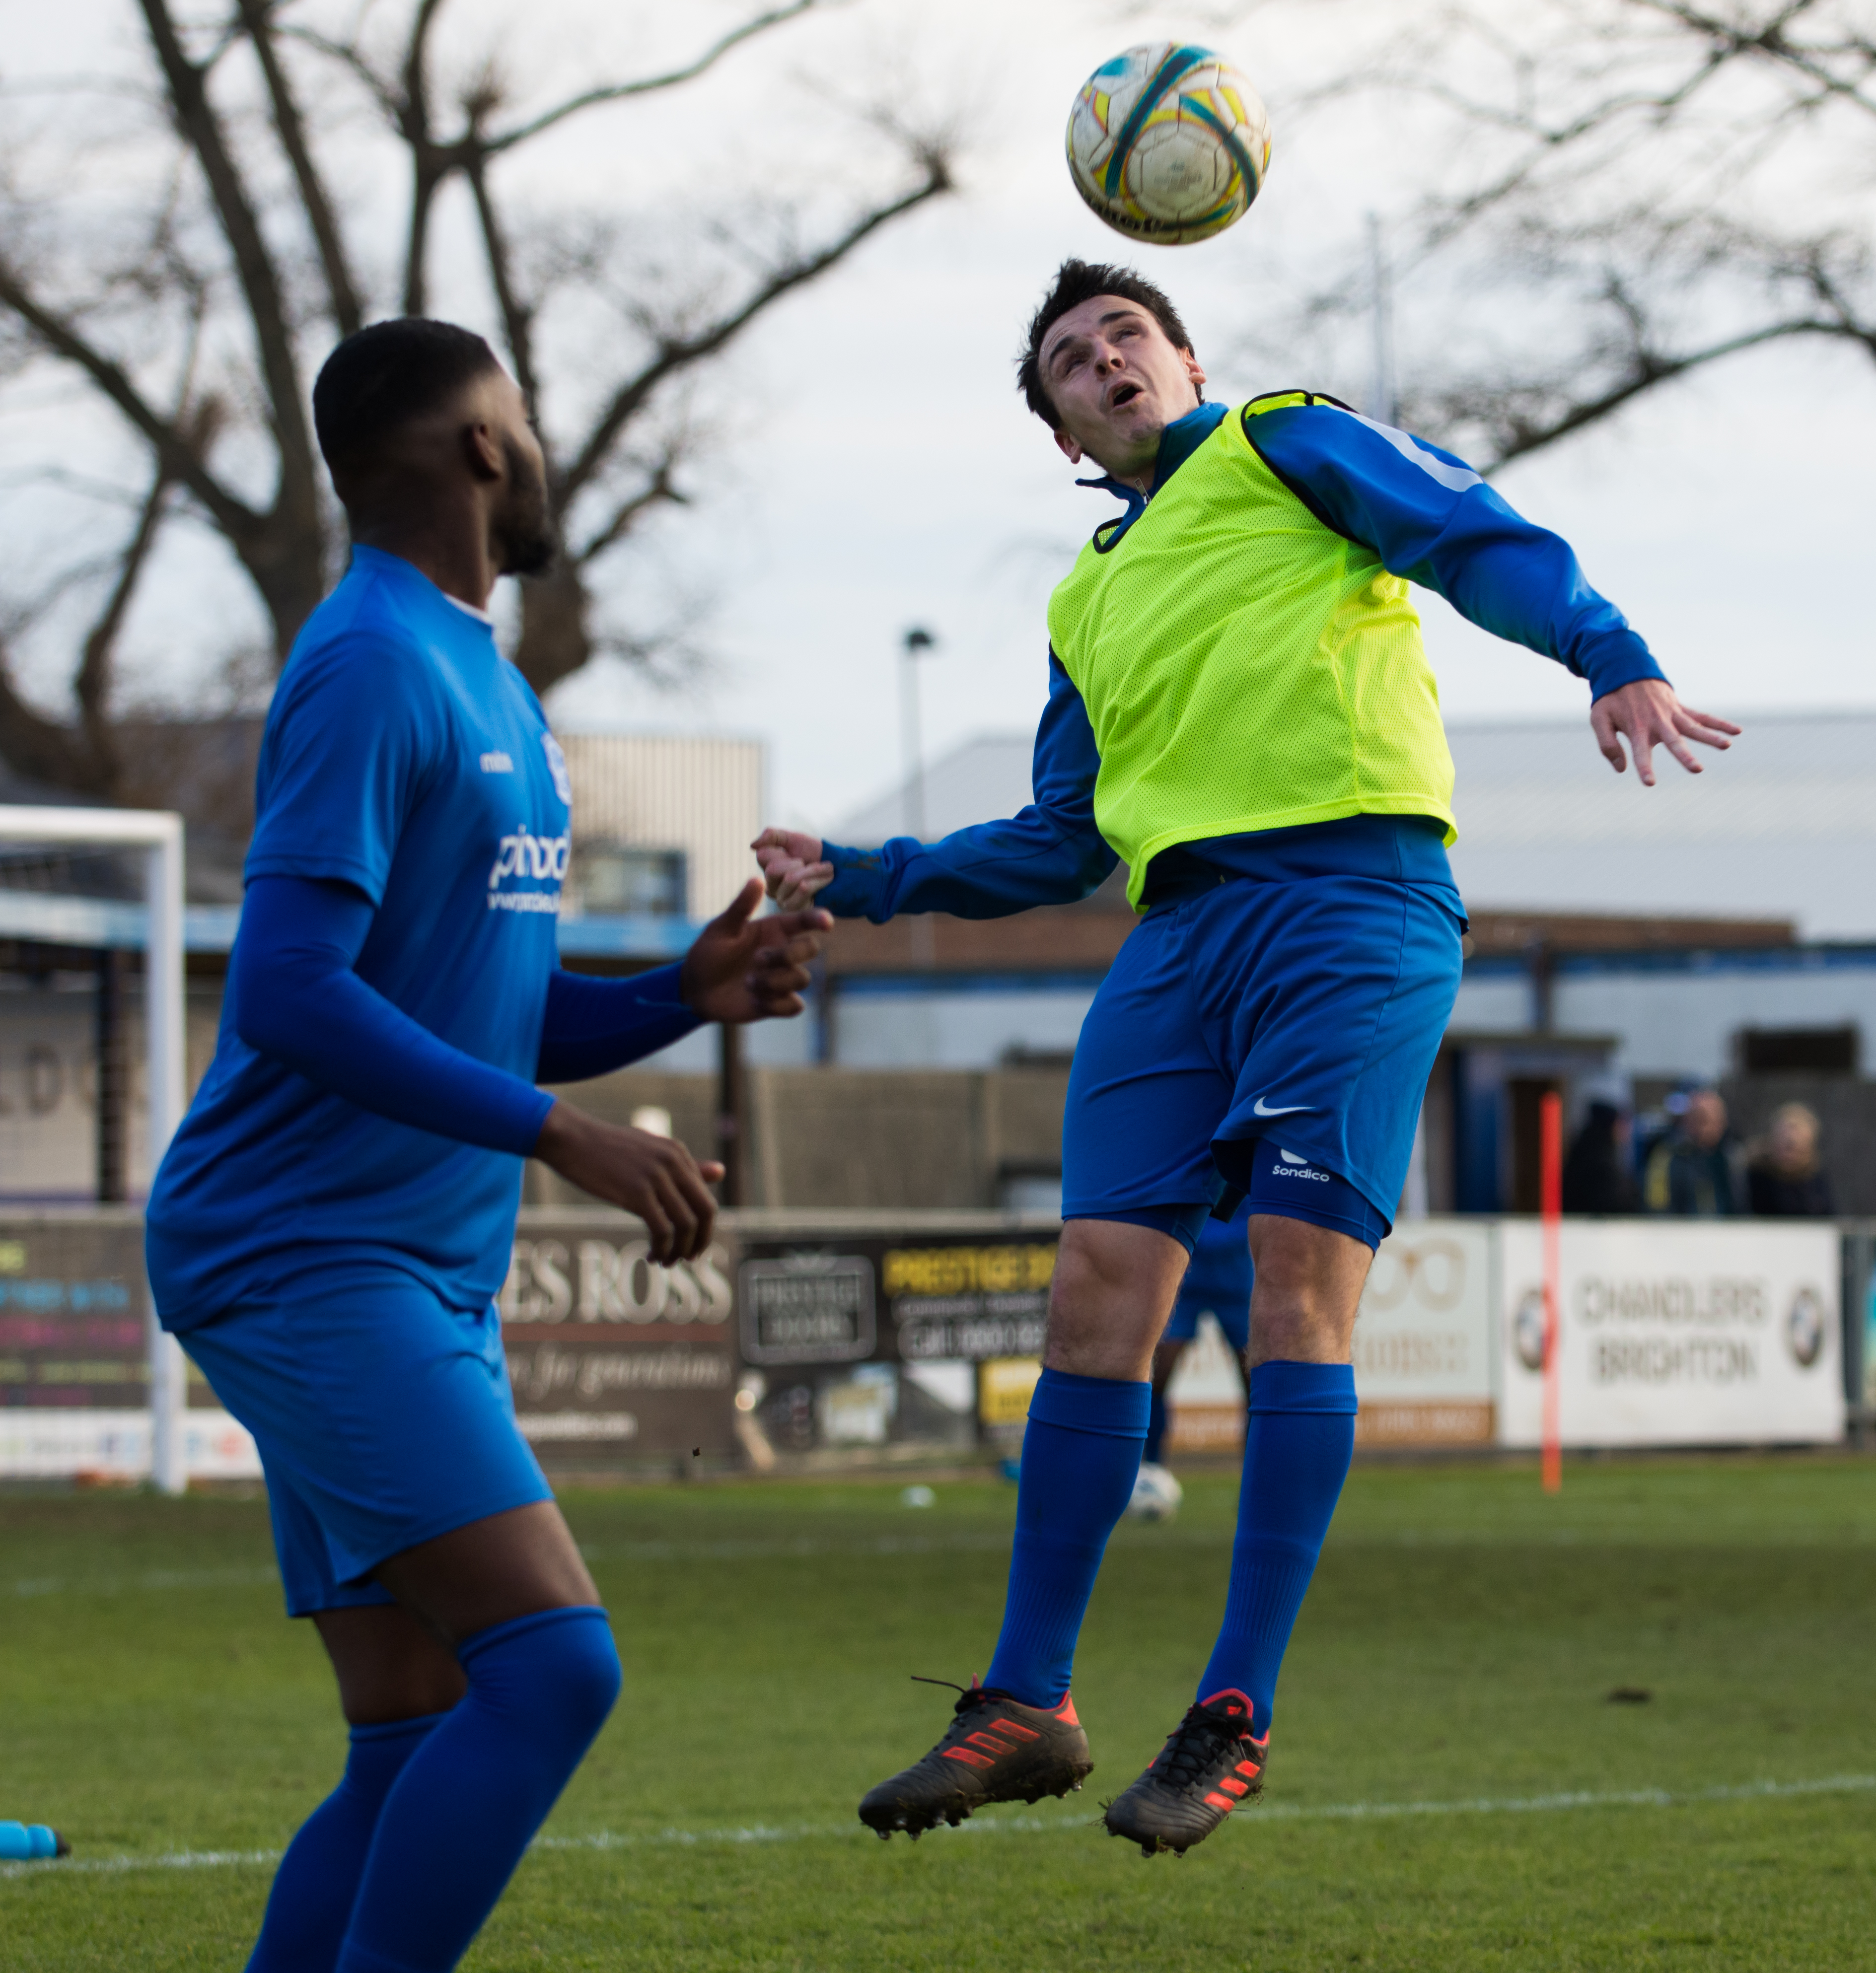 Shoreham FC vs Molesey FC 02.12.17 30